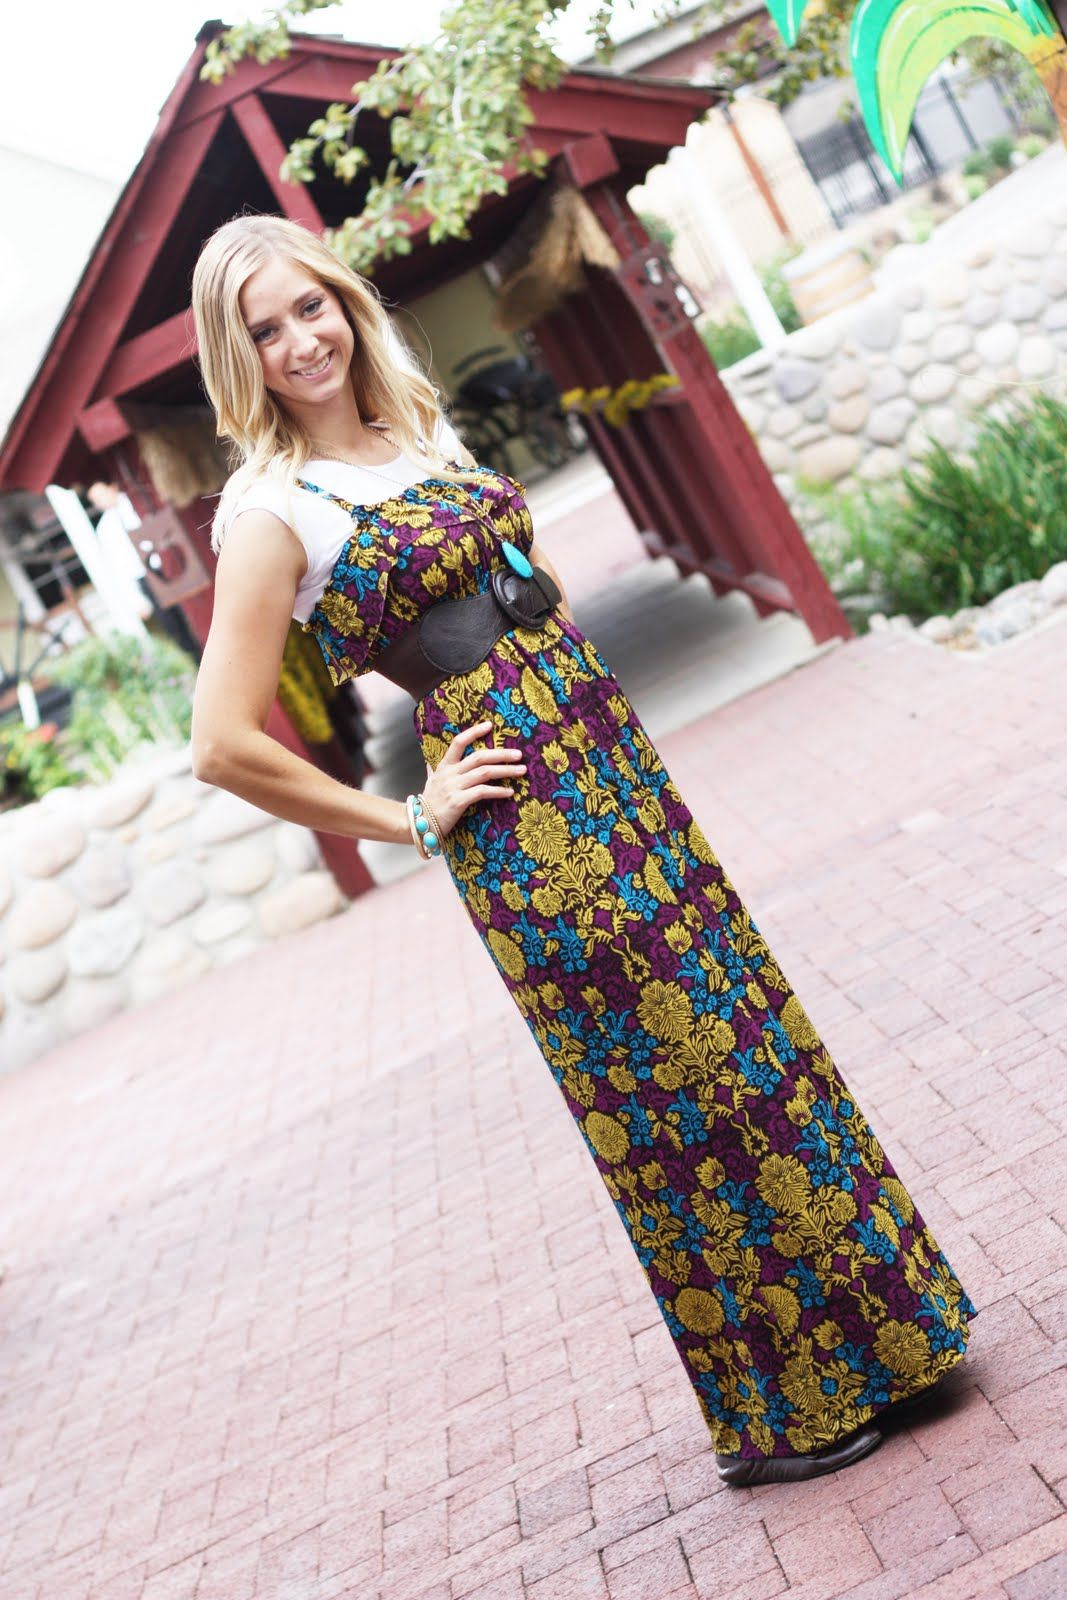 Sew Much Ado The SoHo Maxi Dress Tutorial Crafty Pinterest